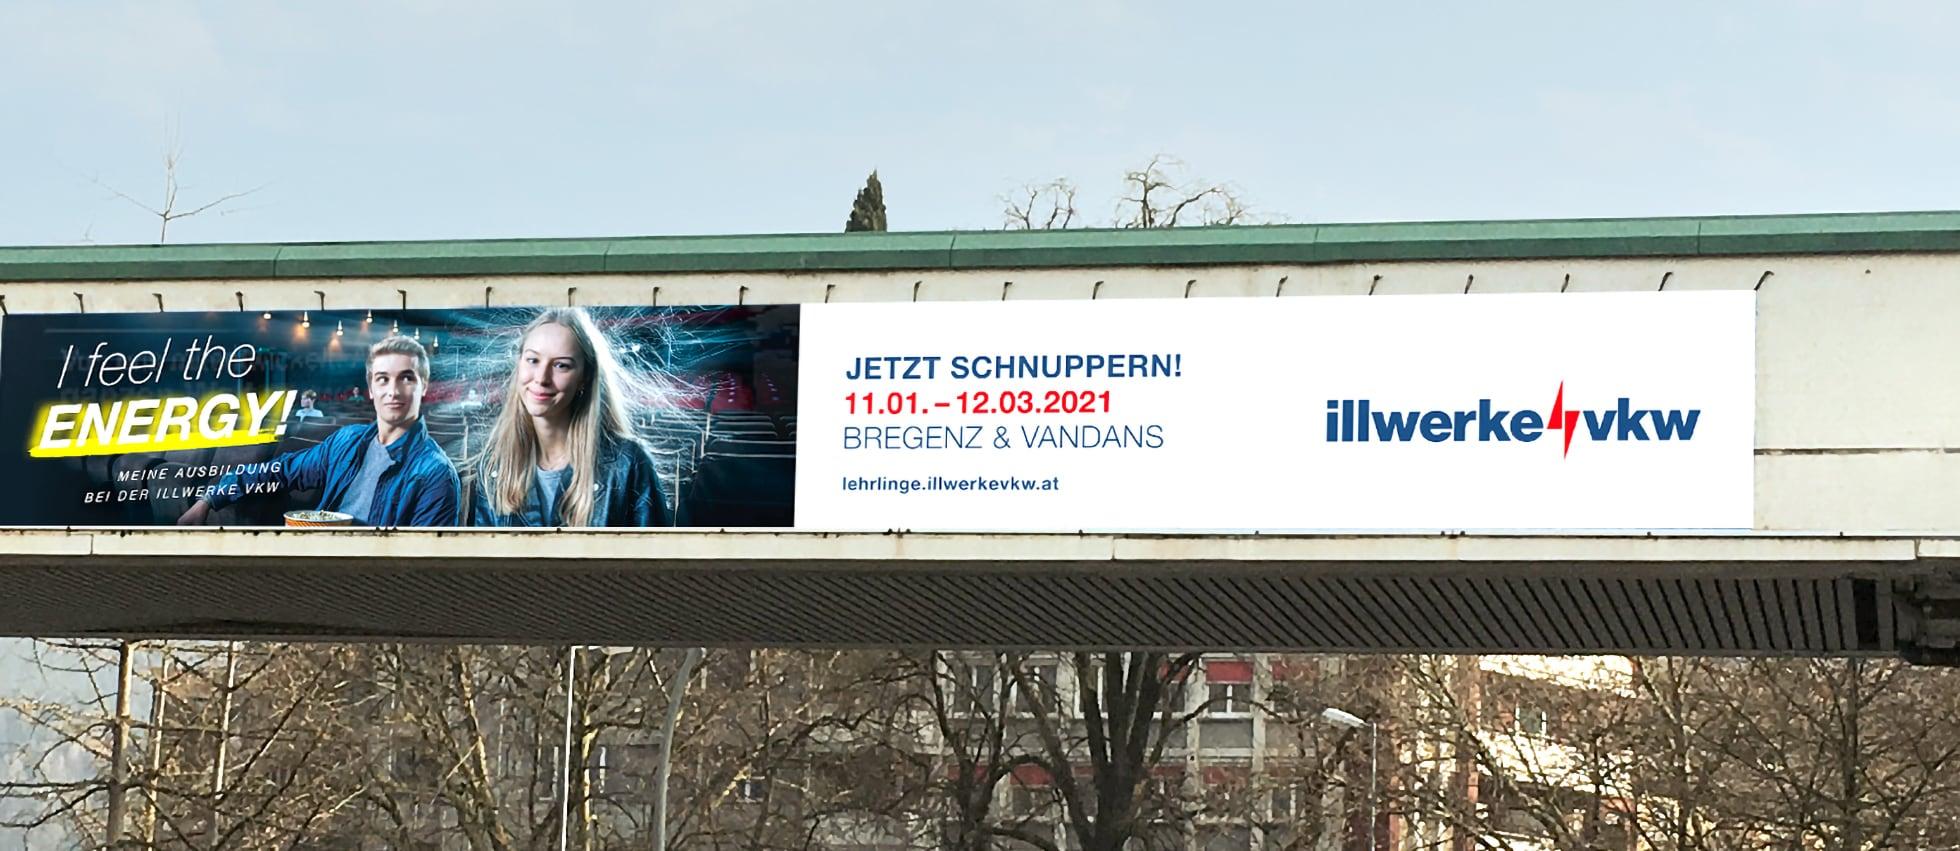 Werbebanner bei Bahnhofsbrücke